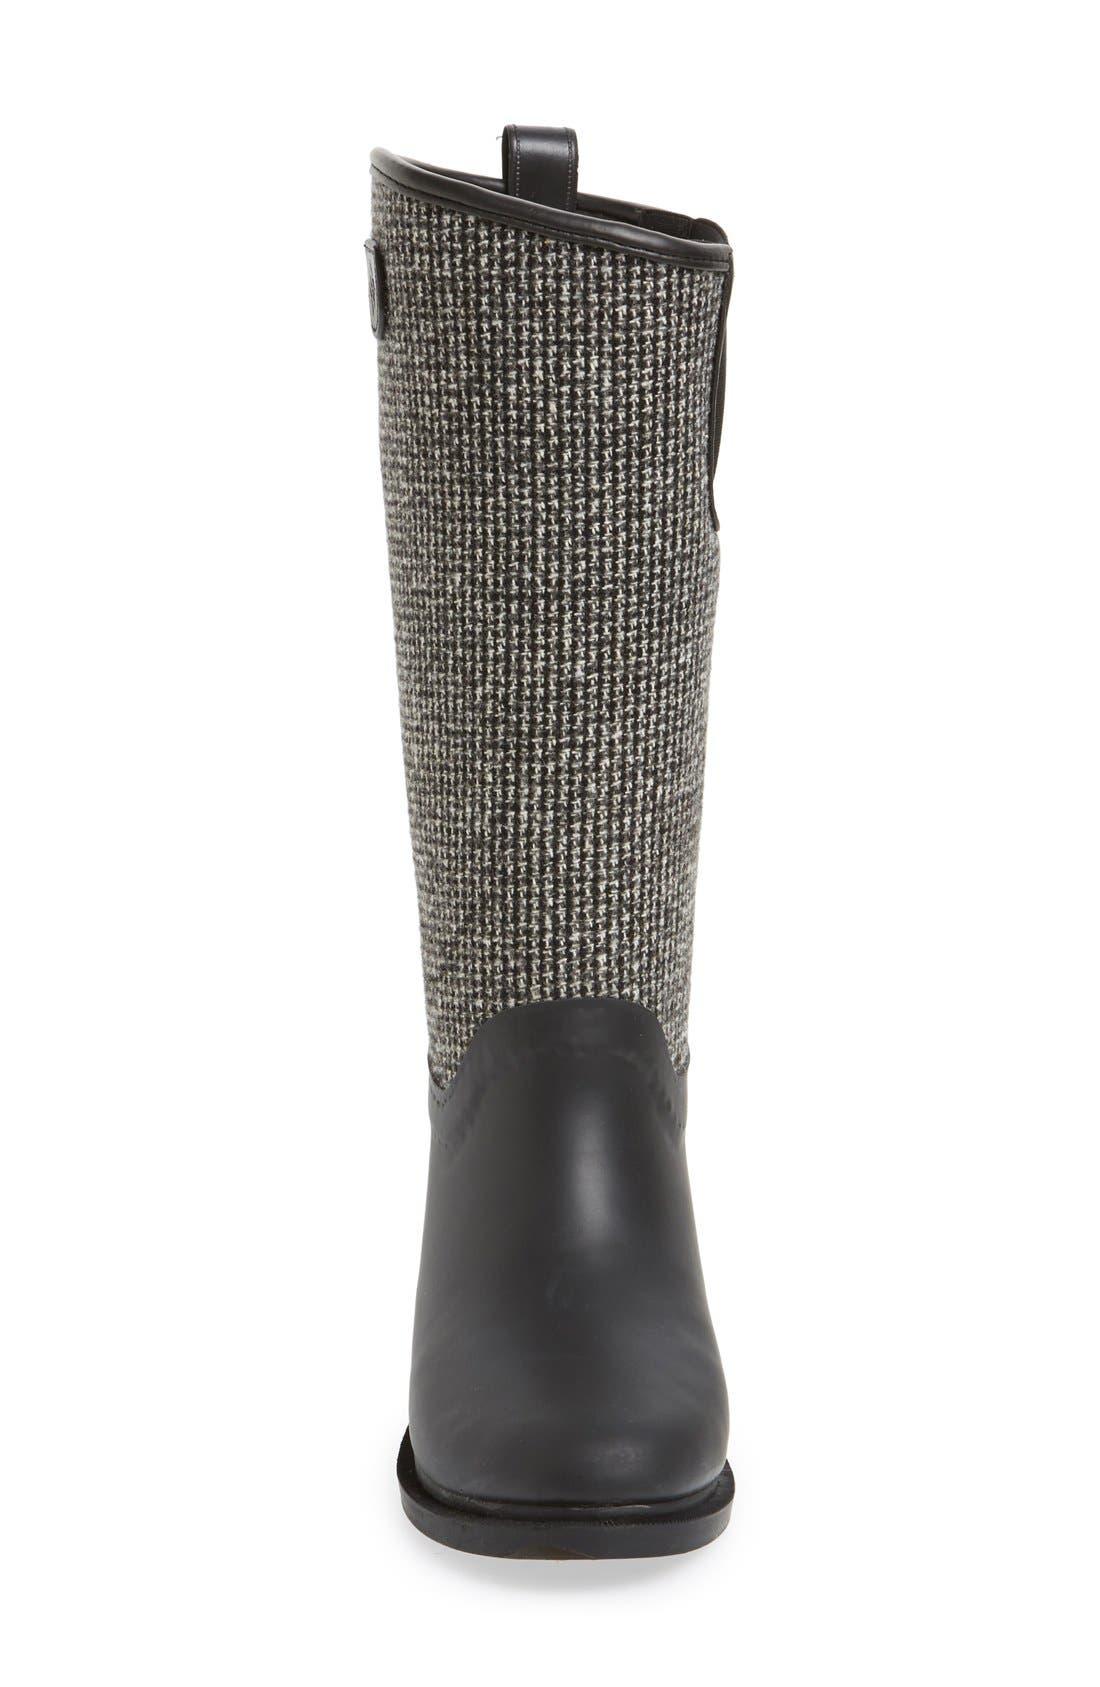 DÄV, Cardiff Tweed Knee High Waterproof Rain Boot, Alternate thumbnail 3, color, BLACK